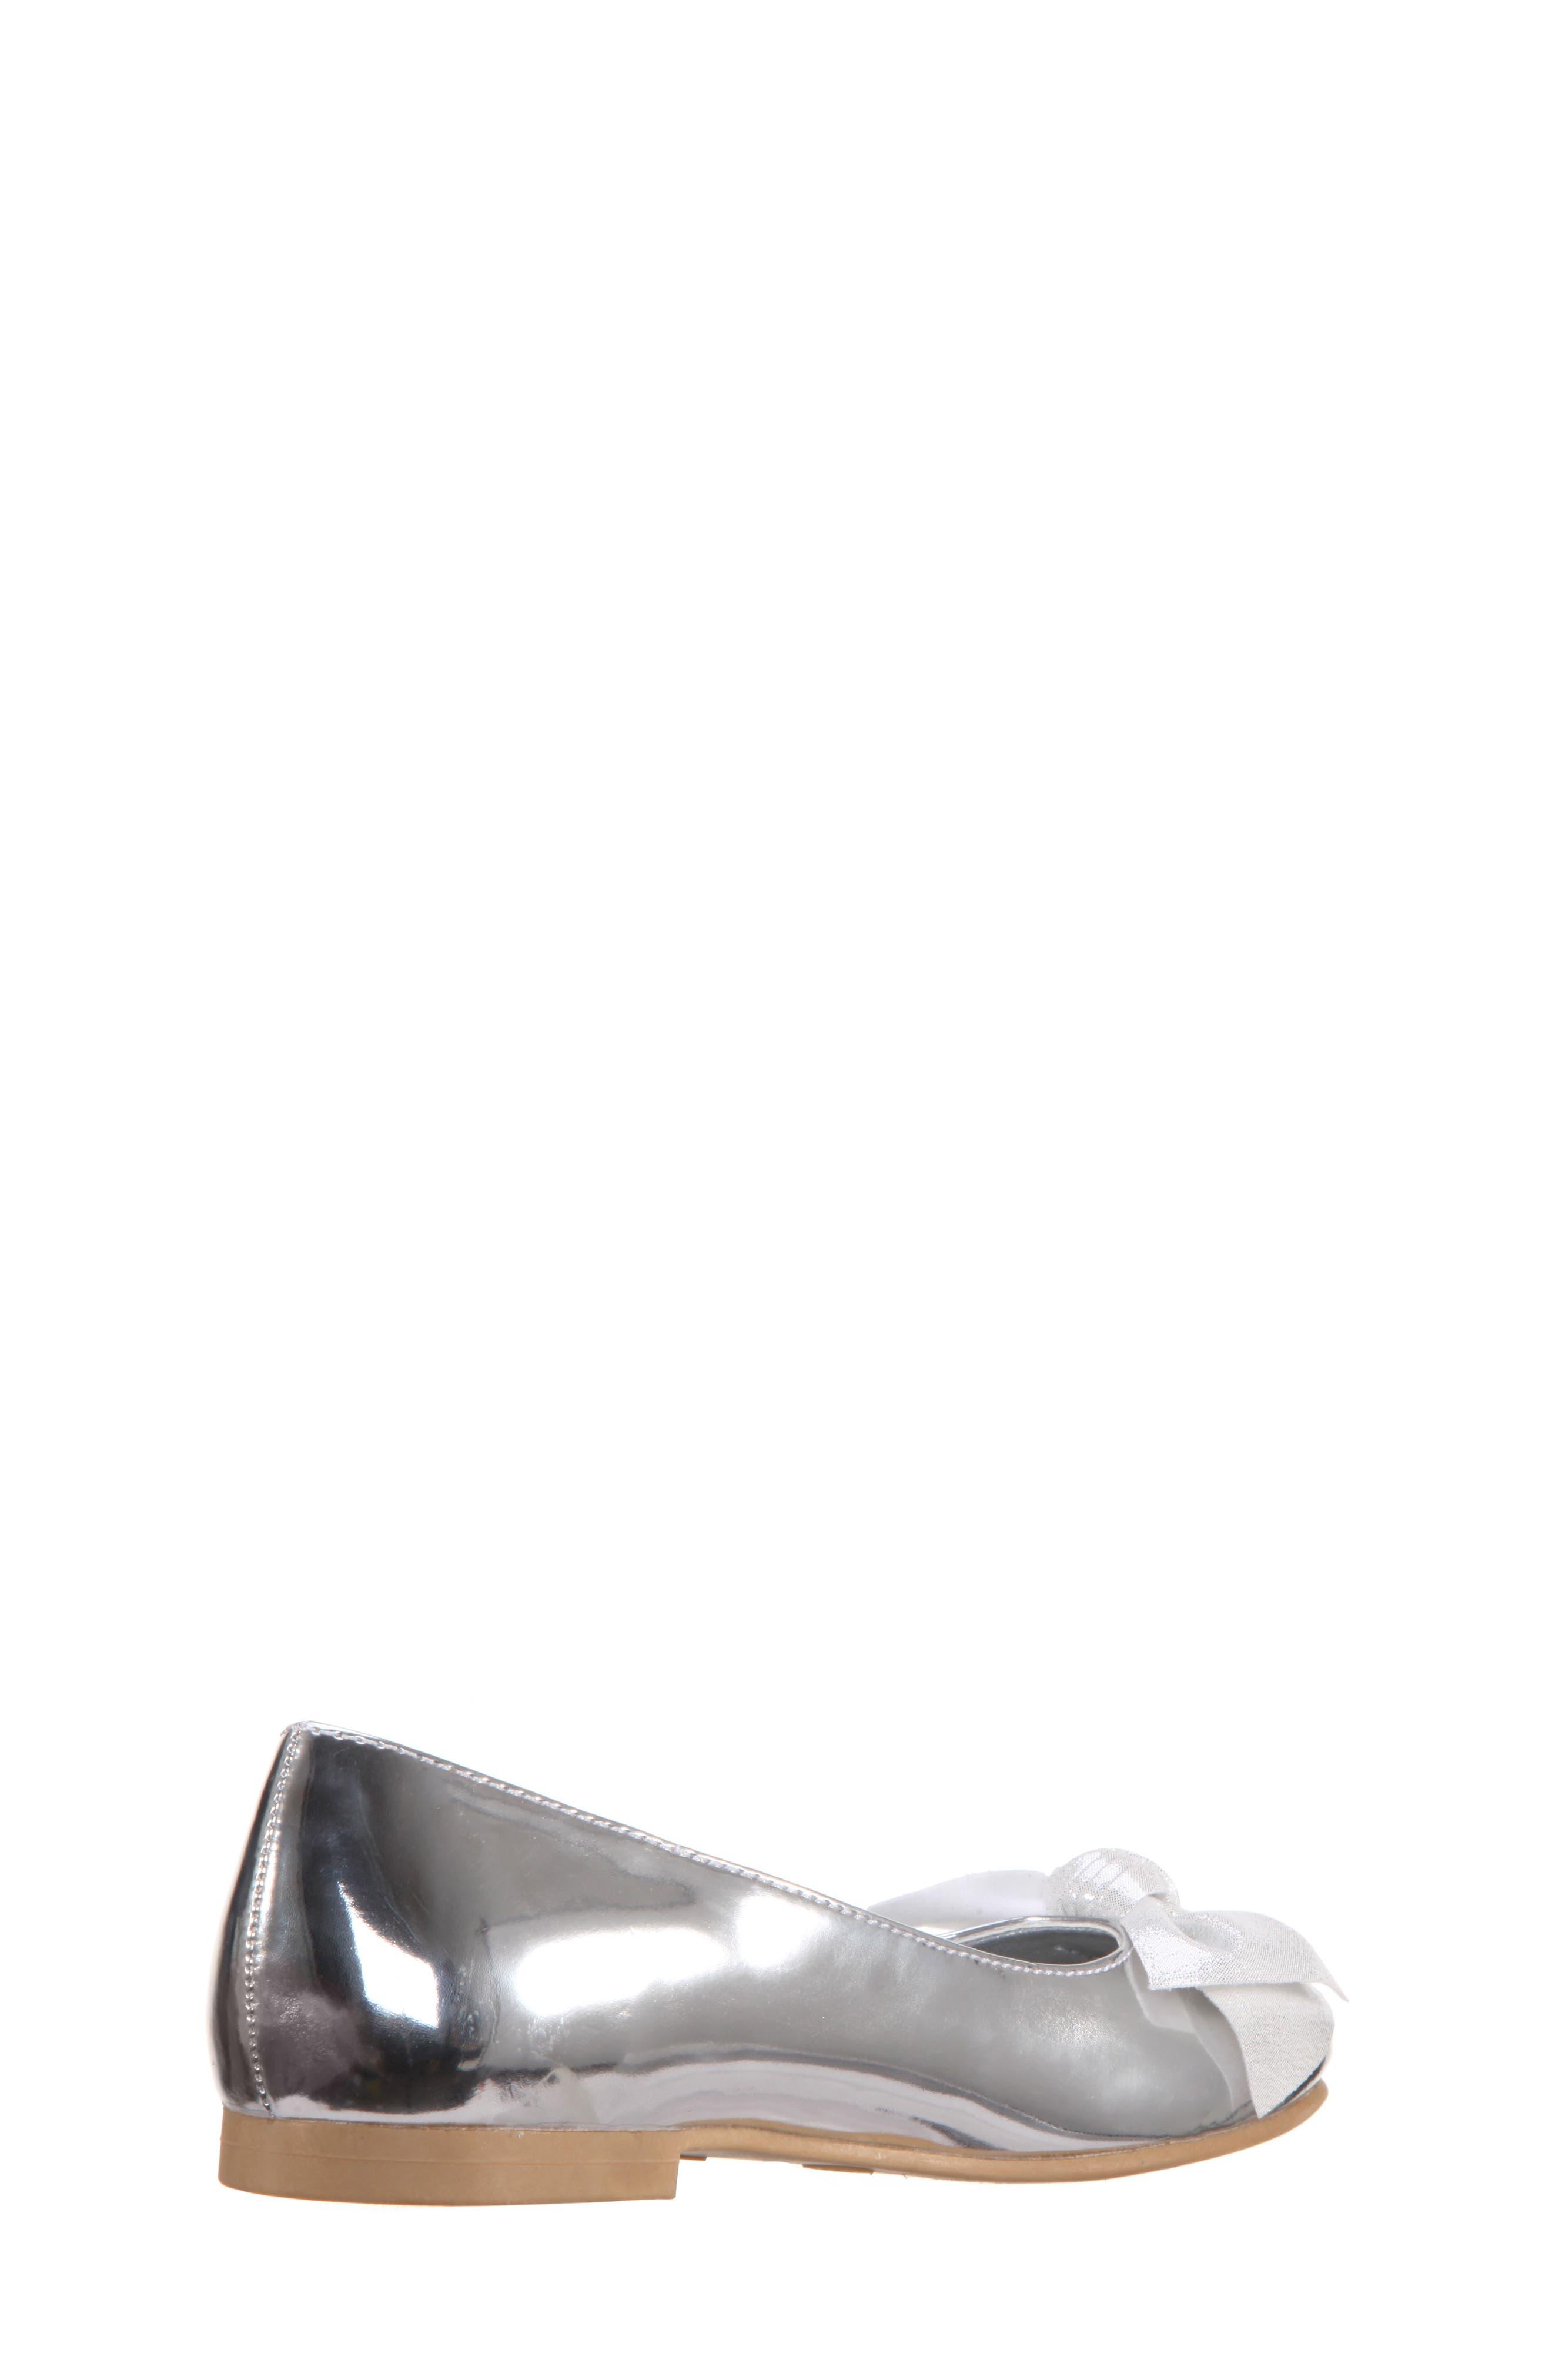 Katelyn Glitter Bow Metallic Ballet Flat,                             Alternate thumbnail 2, color,                             048